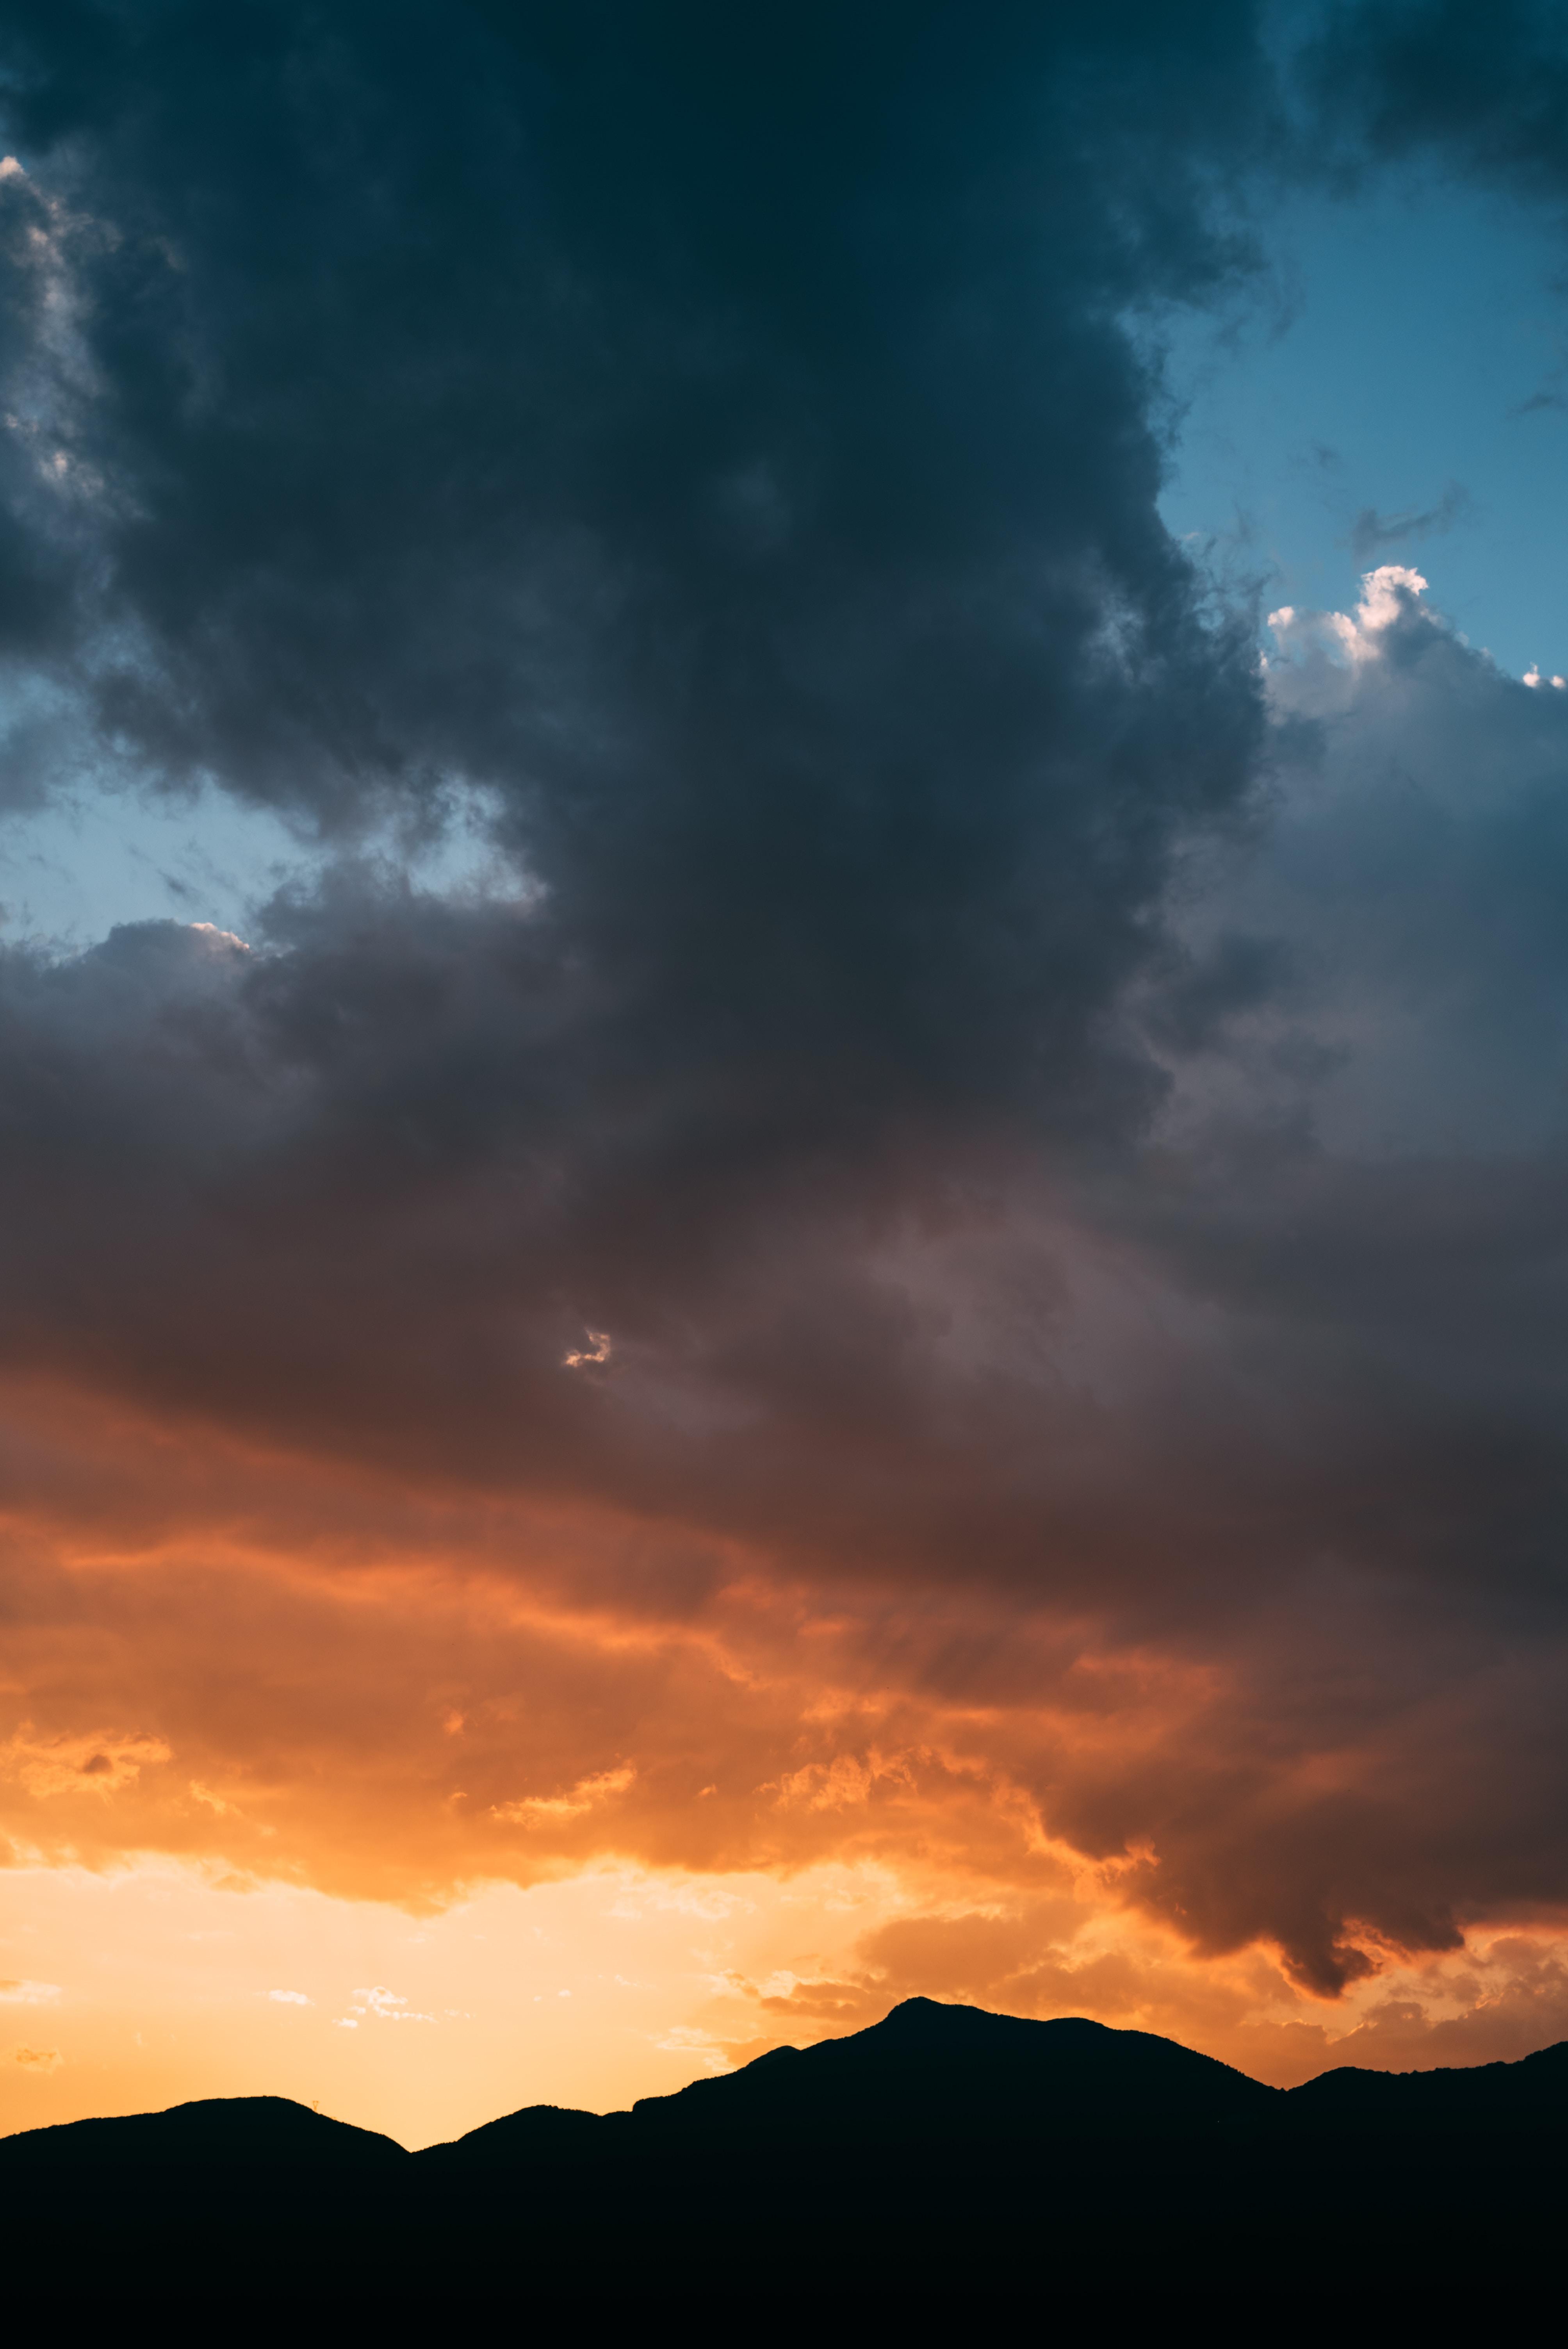 nimbus clouds during golden hour